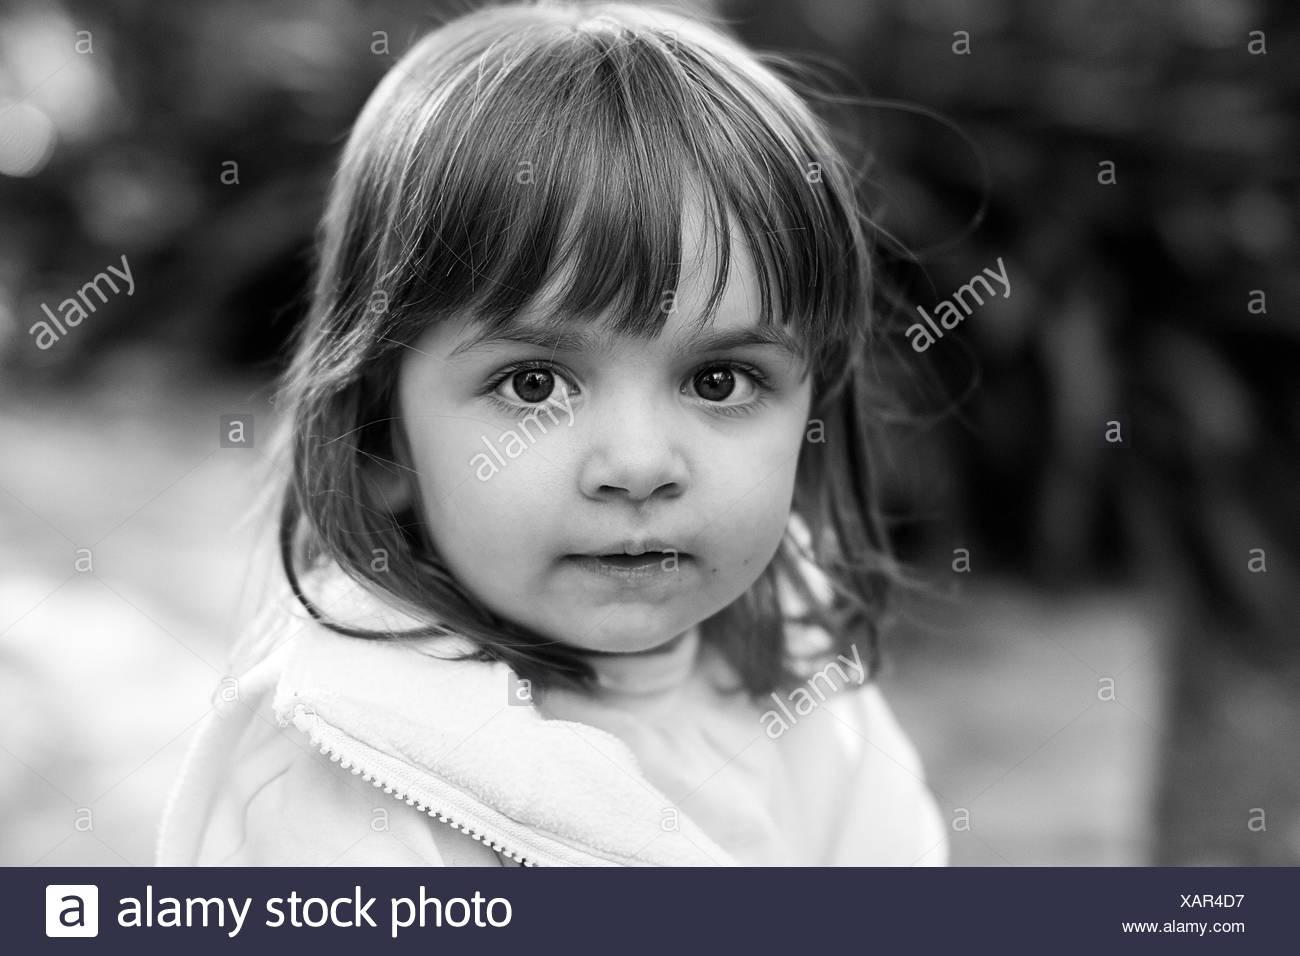 Argentina, Buenos Aires, Retrato de niña (2-3) mirando a la cámara Imagen De Stock